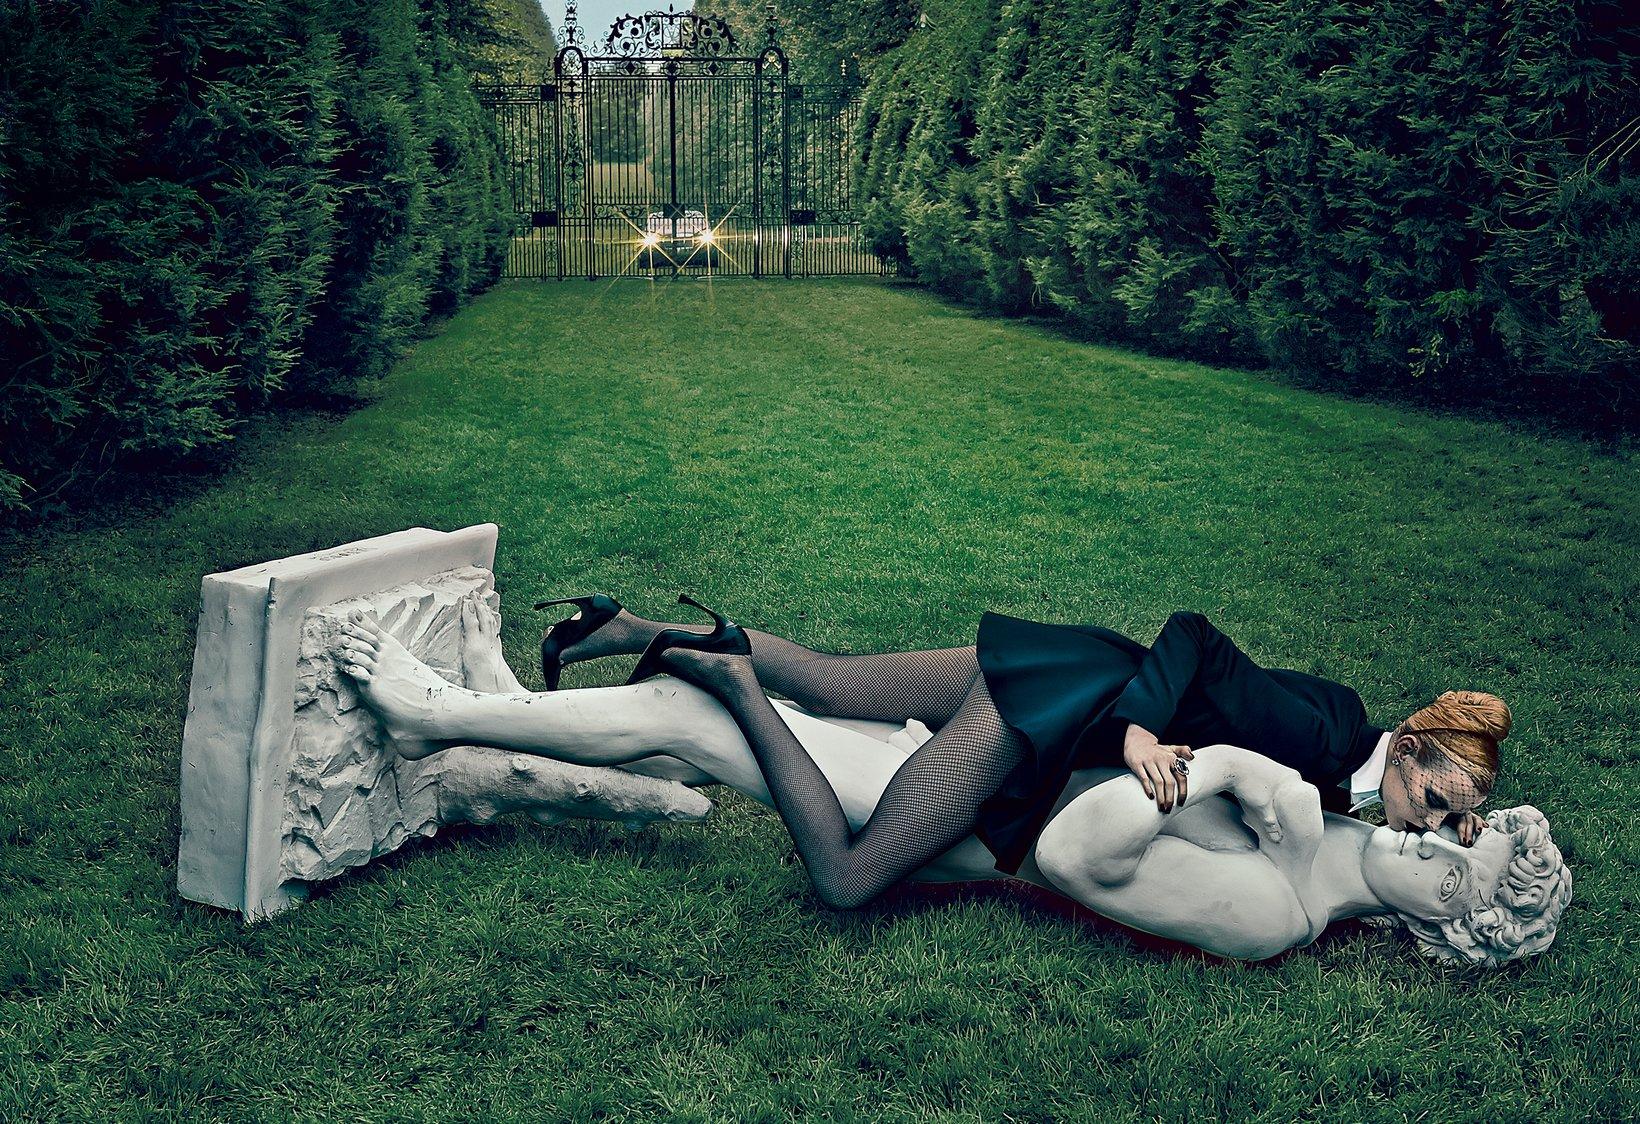 Elza Luijendijk in Christian Dior